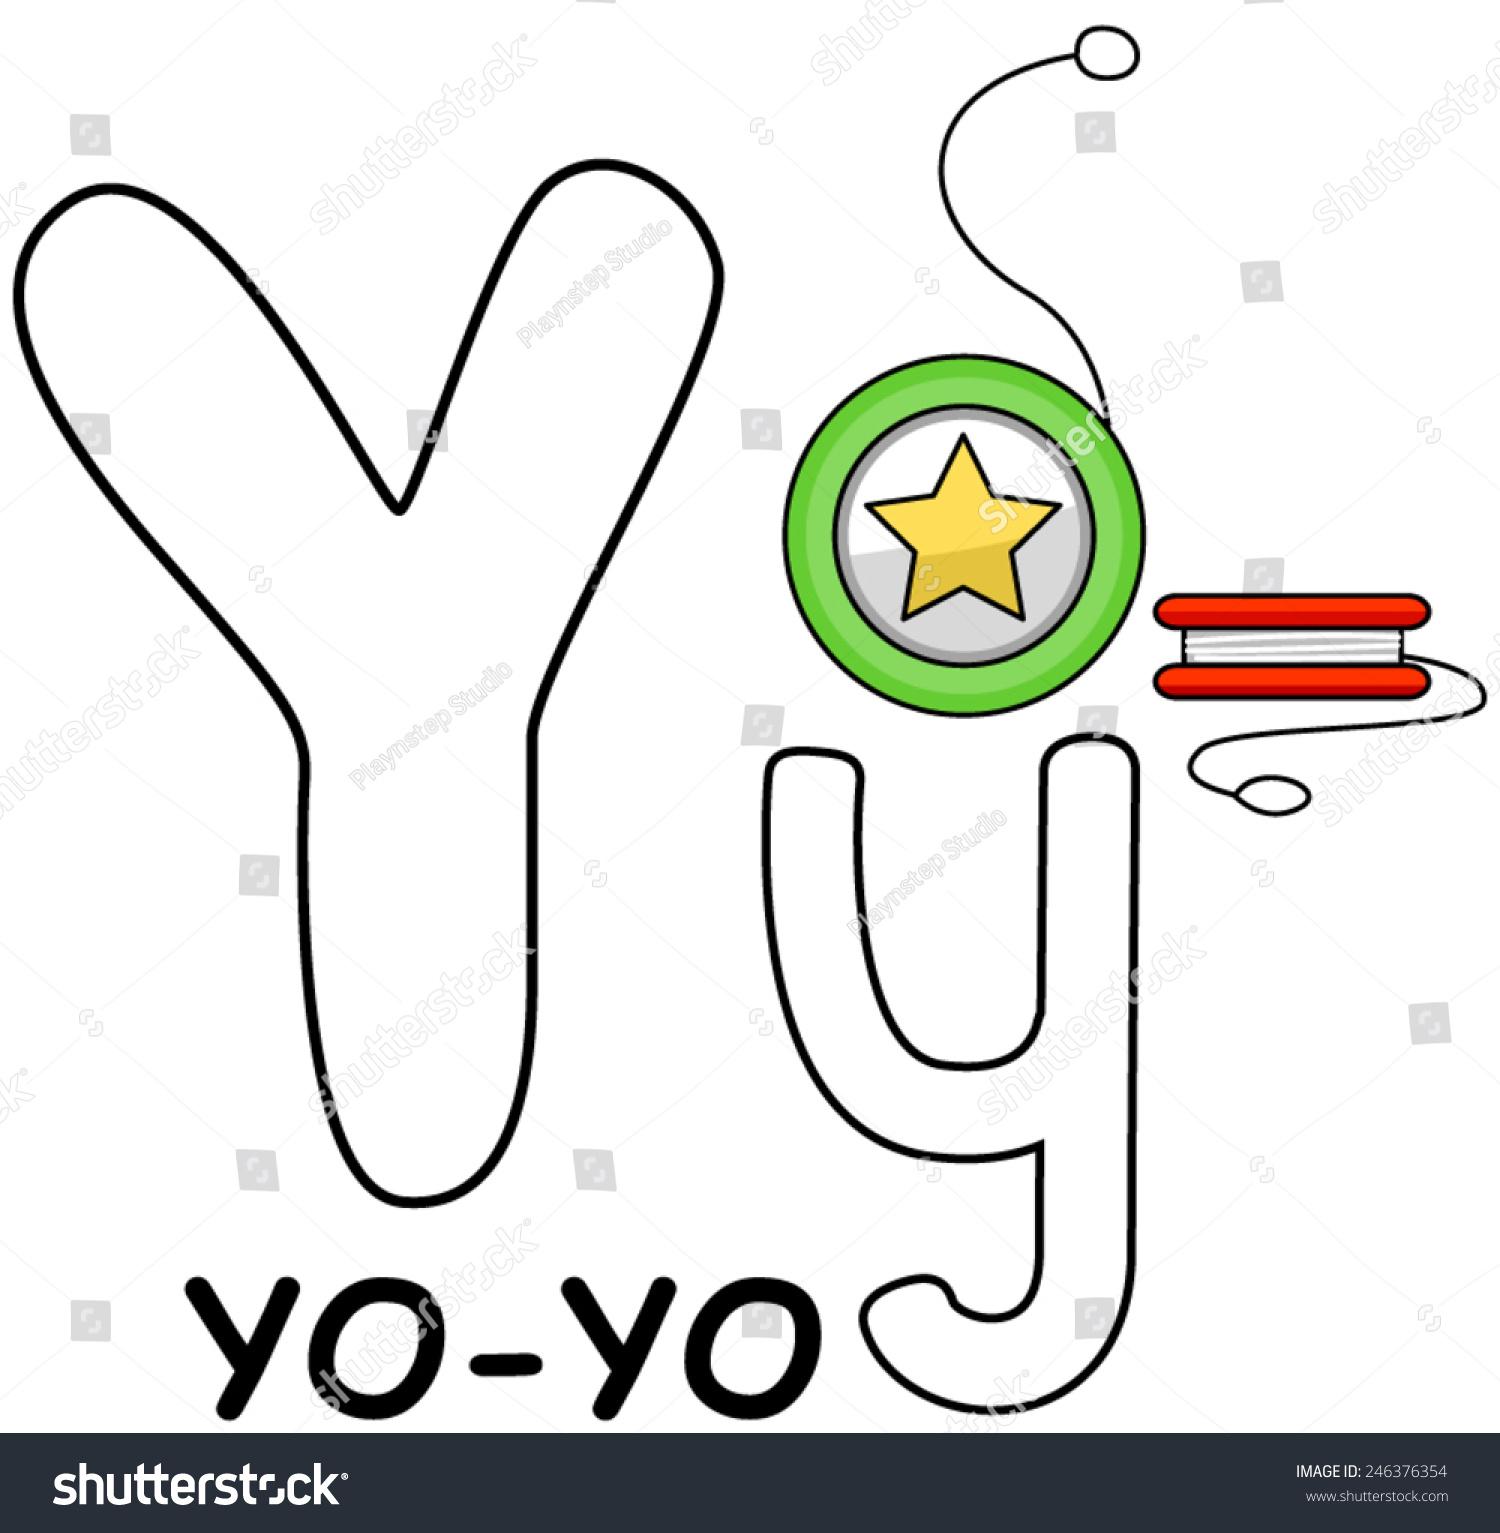 Letter y yoyo stock vector 246376354 shutterstock letter y yo yo buycottarizona Images